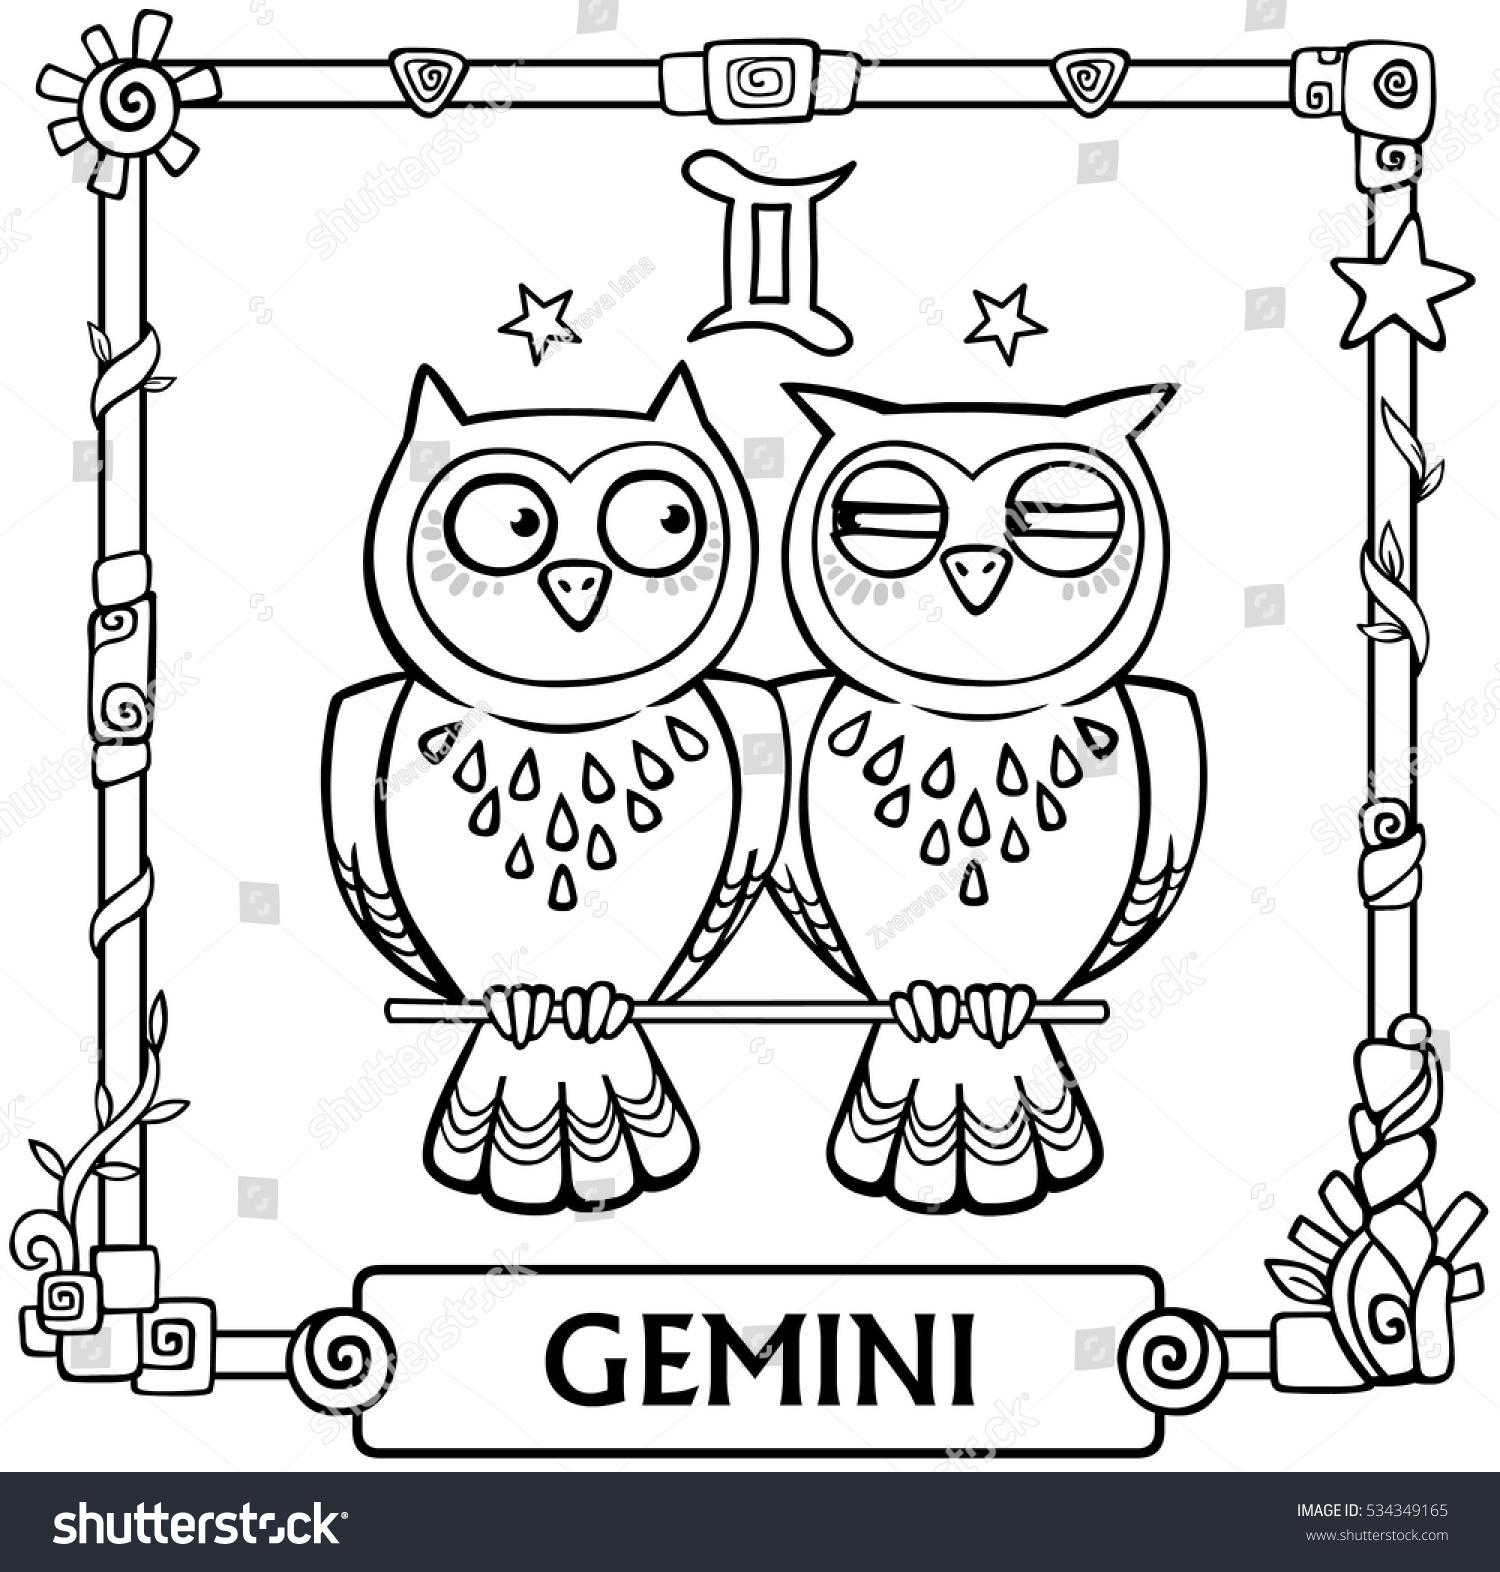 Zodiac sign gemini fantastic animation animal stock vector zodiac sign gemini fantastic animation animal linear drawing vector illustration be used biocorpaavc